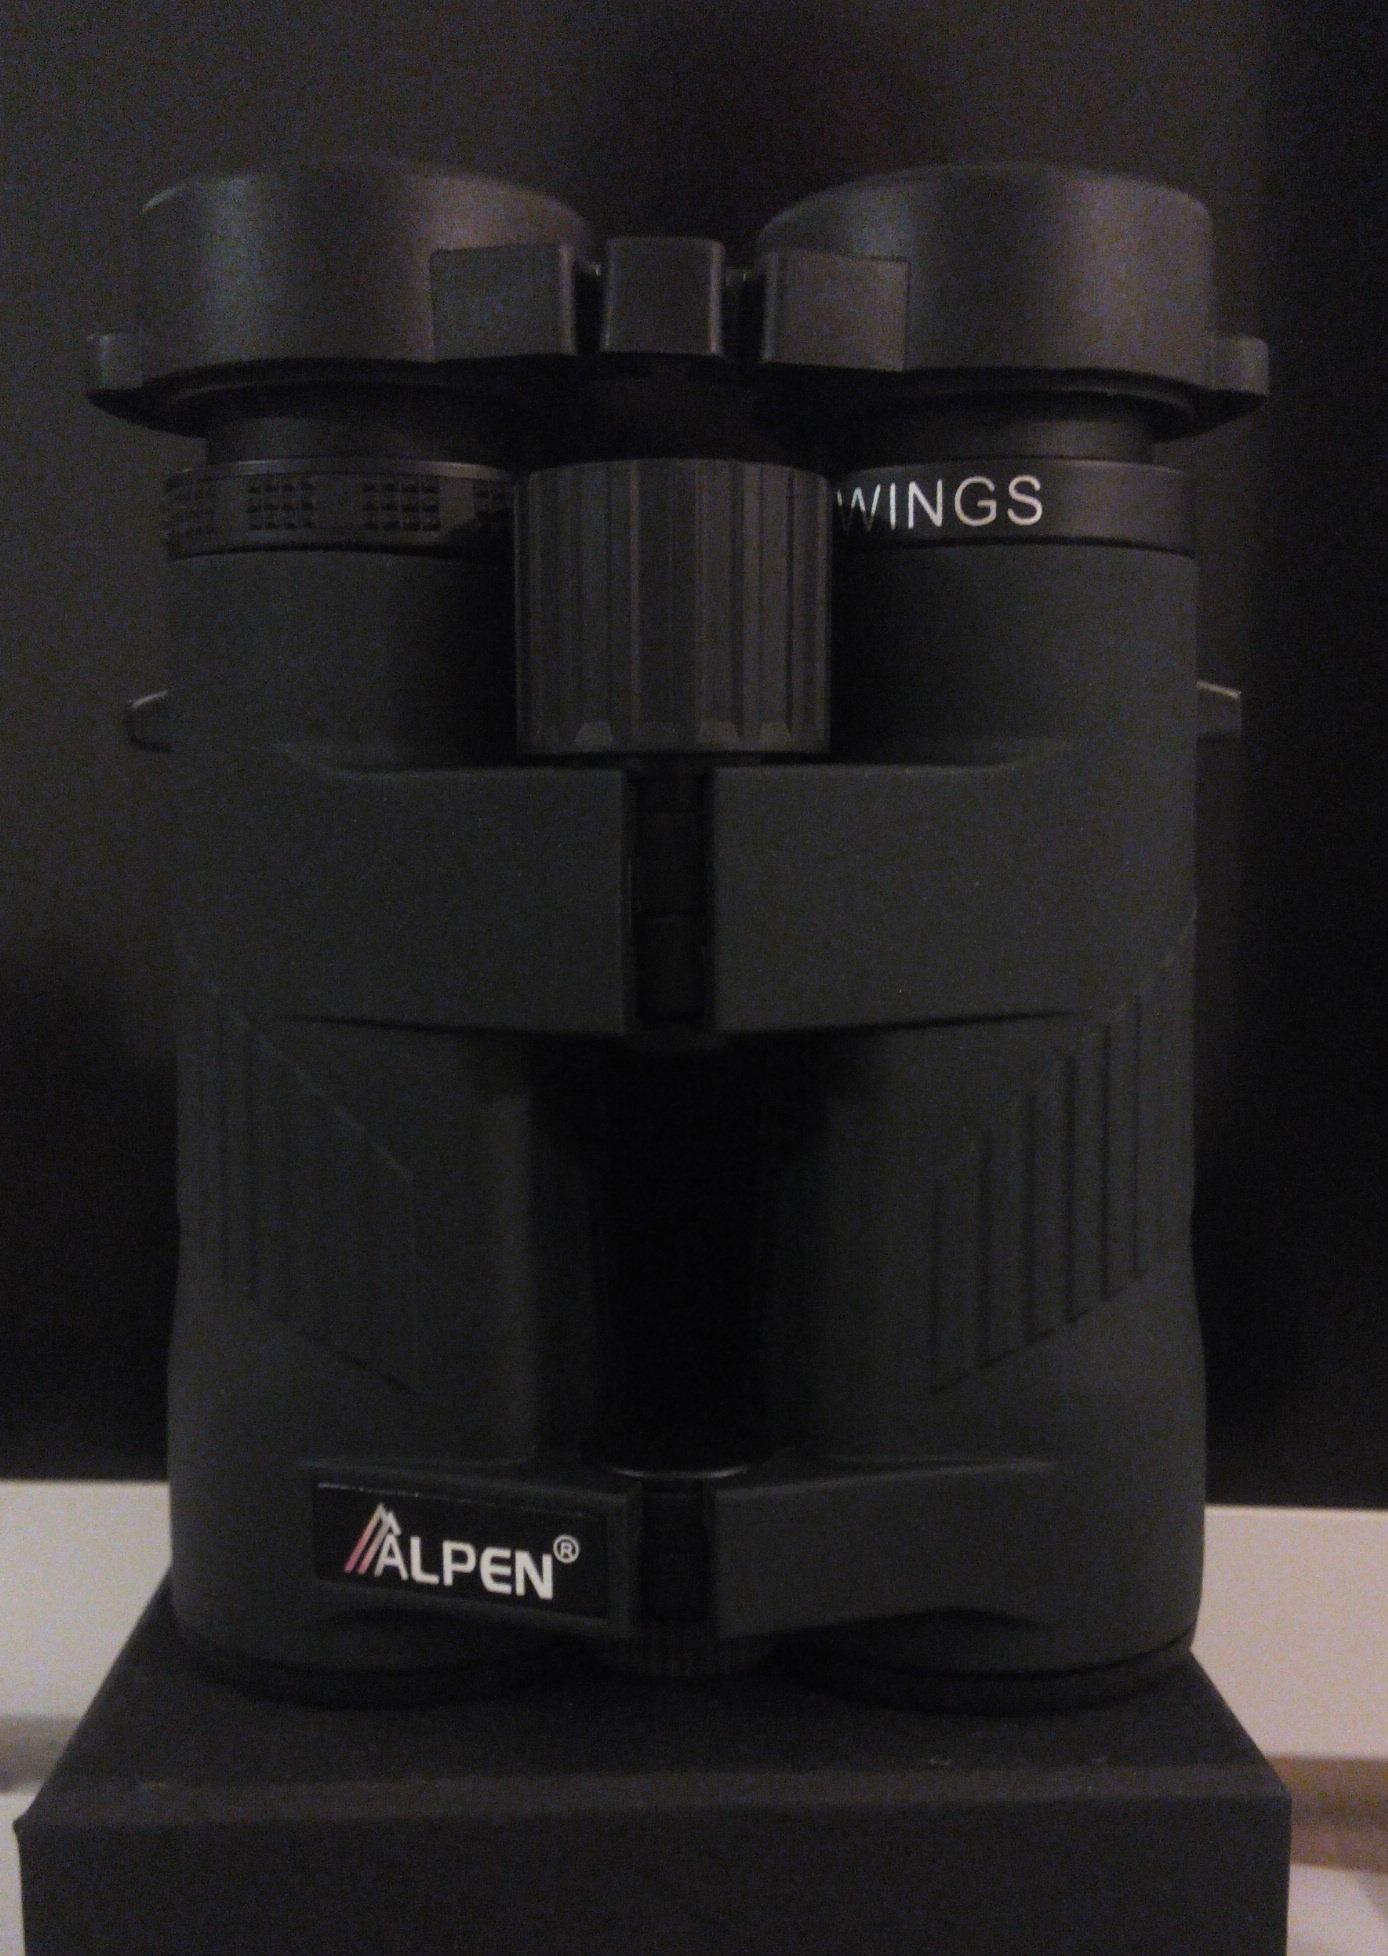 Alpen-Wing-bouchon.jpg.a02a68218b1f6808829b8cdb98e14006.jpg